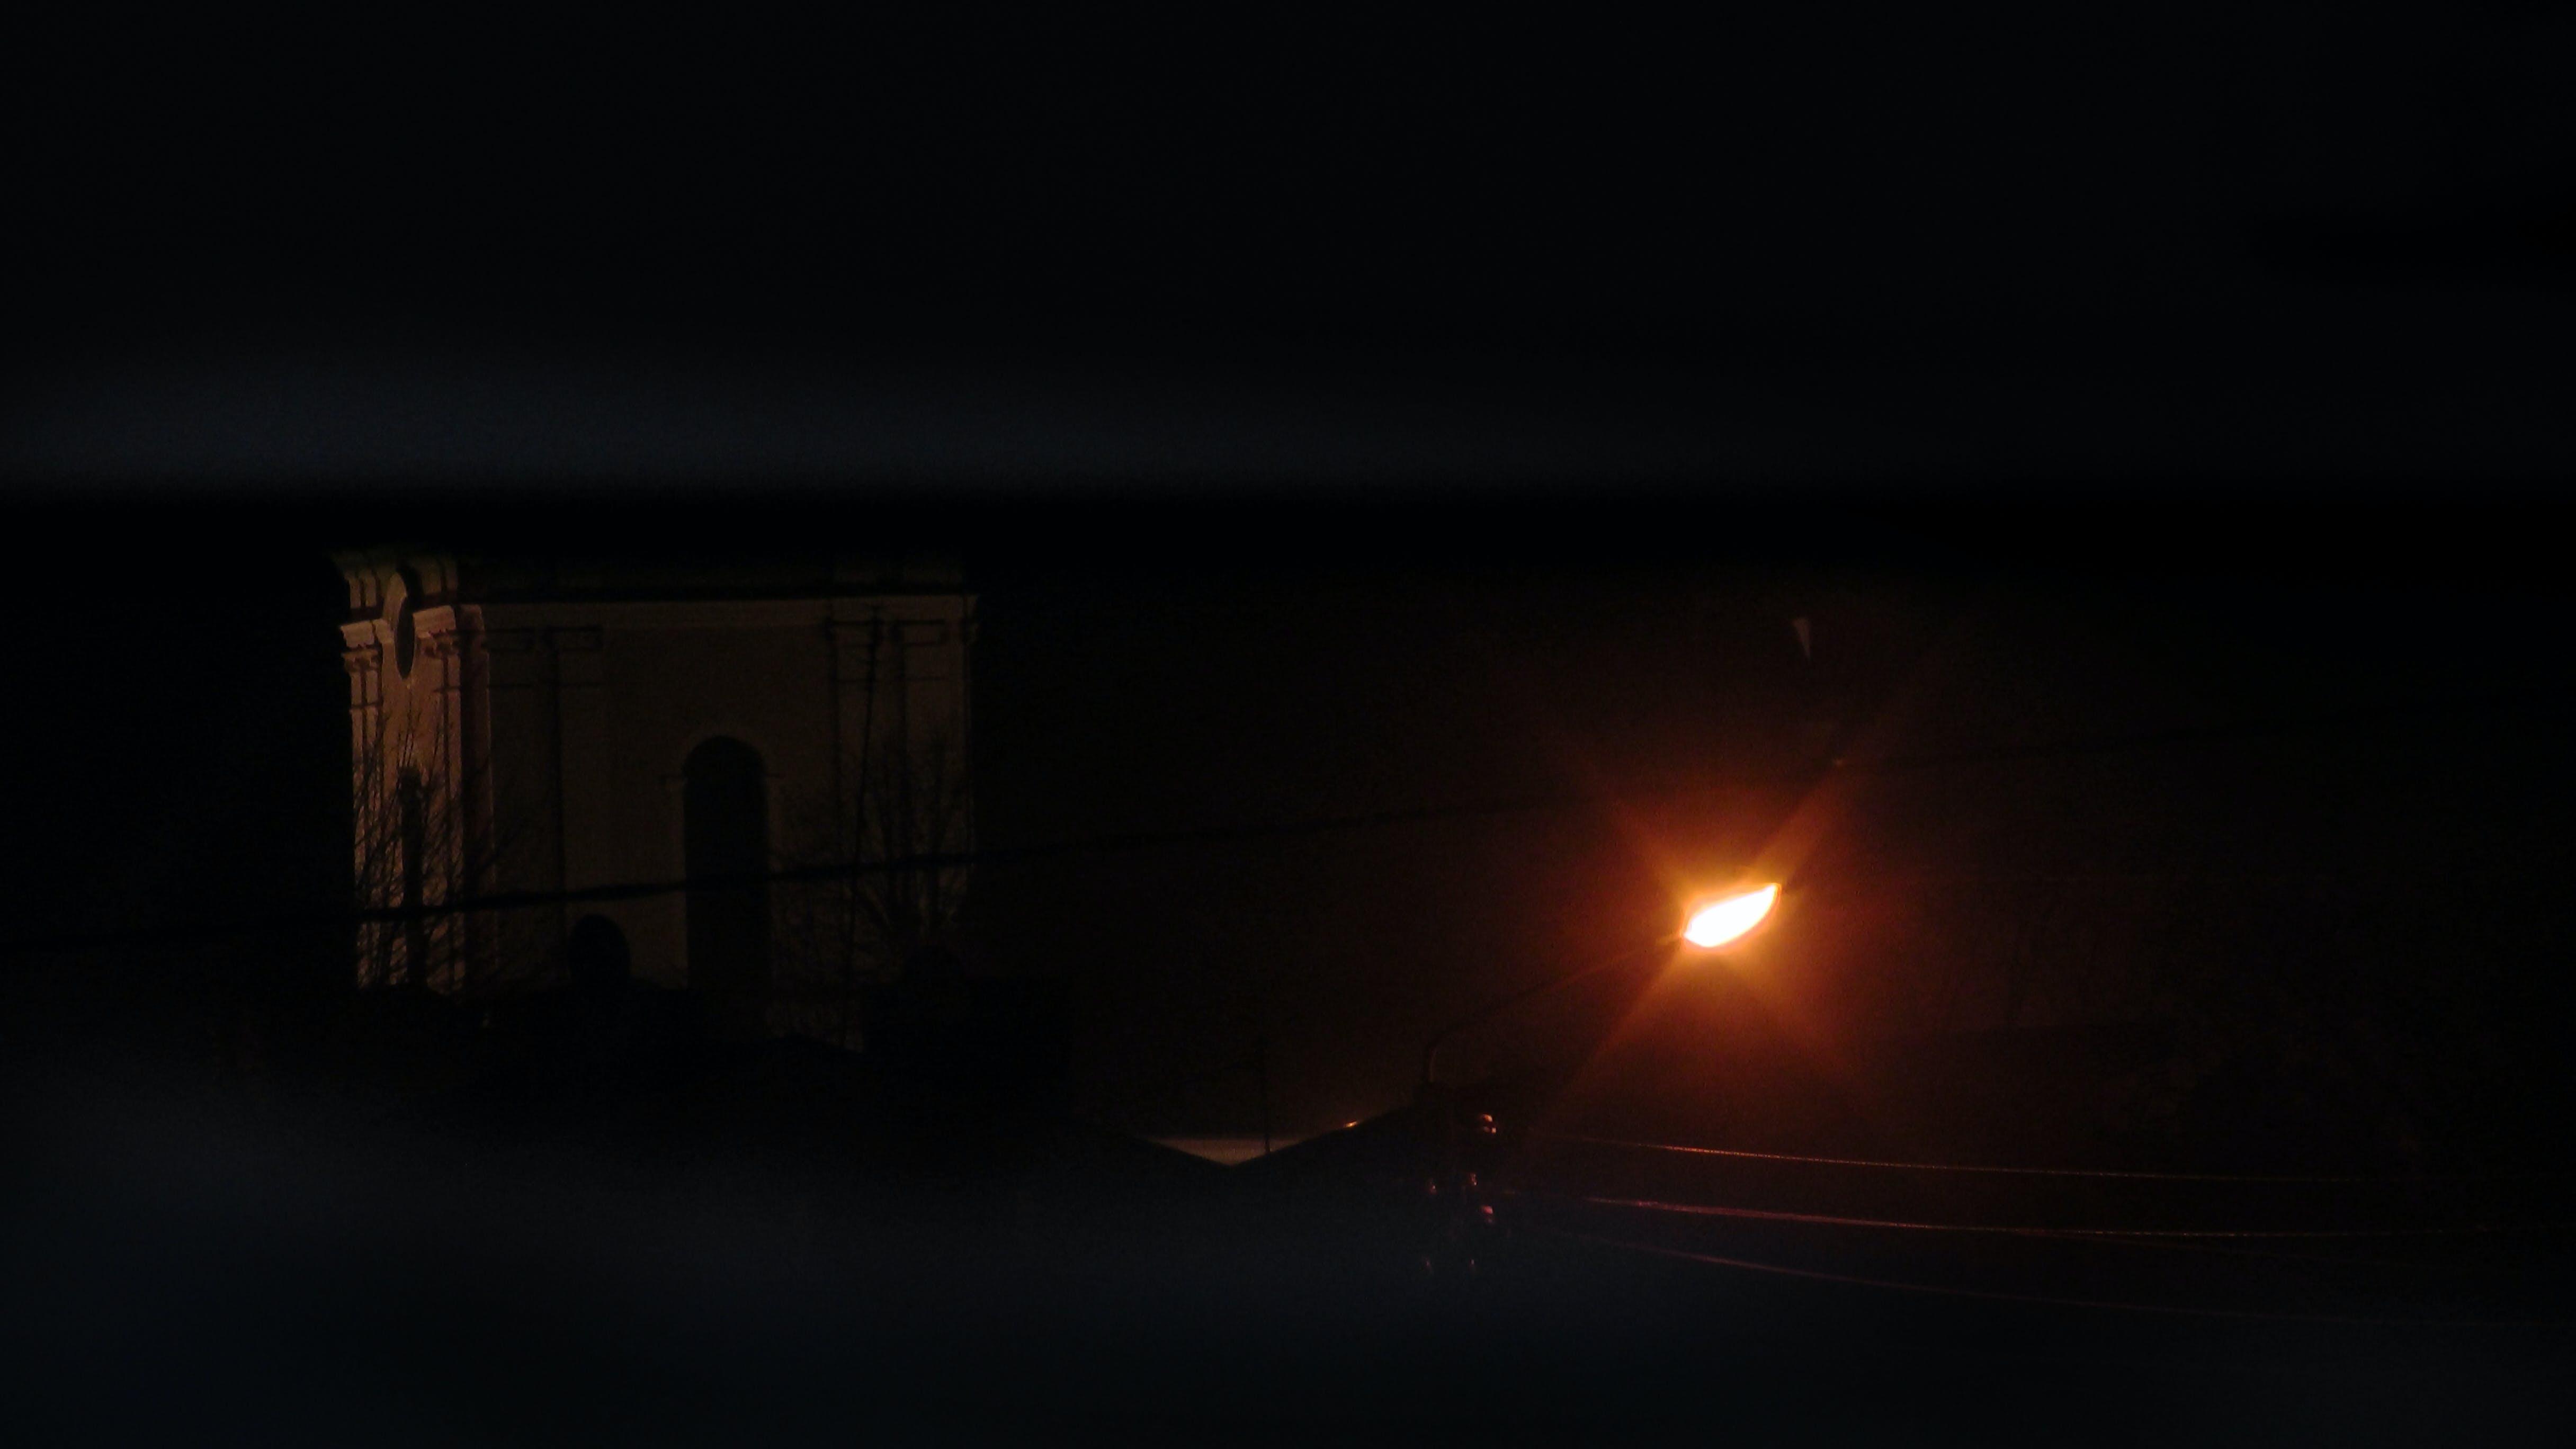 Free stock photo of attic, church, city, dark